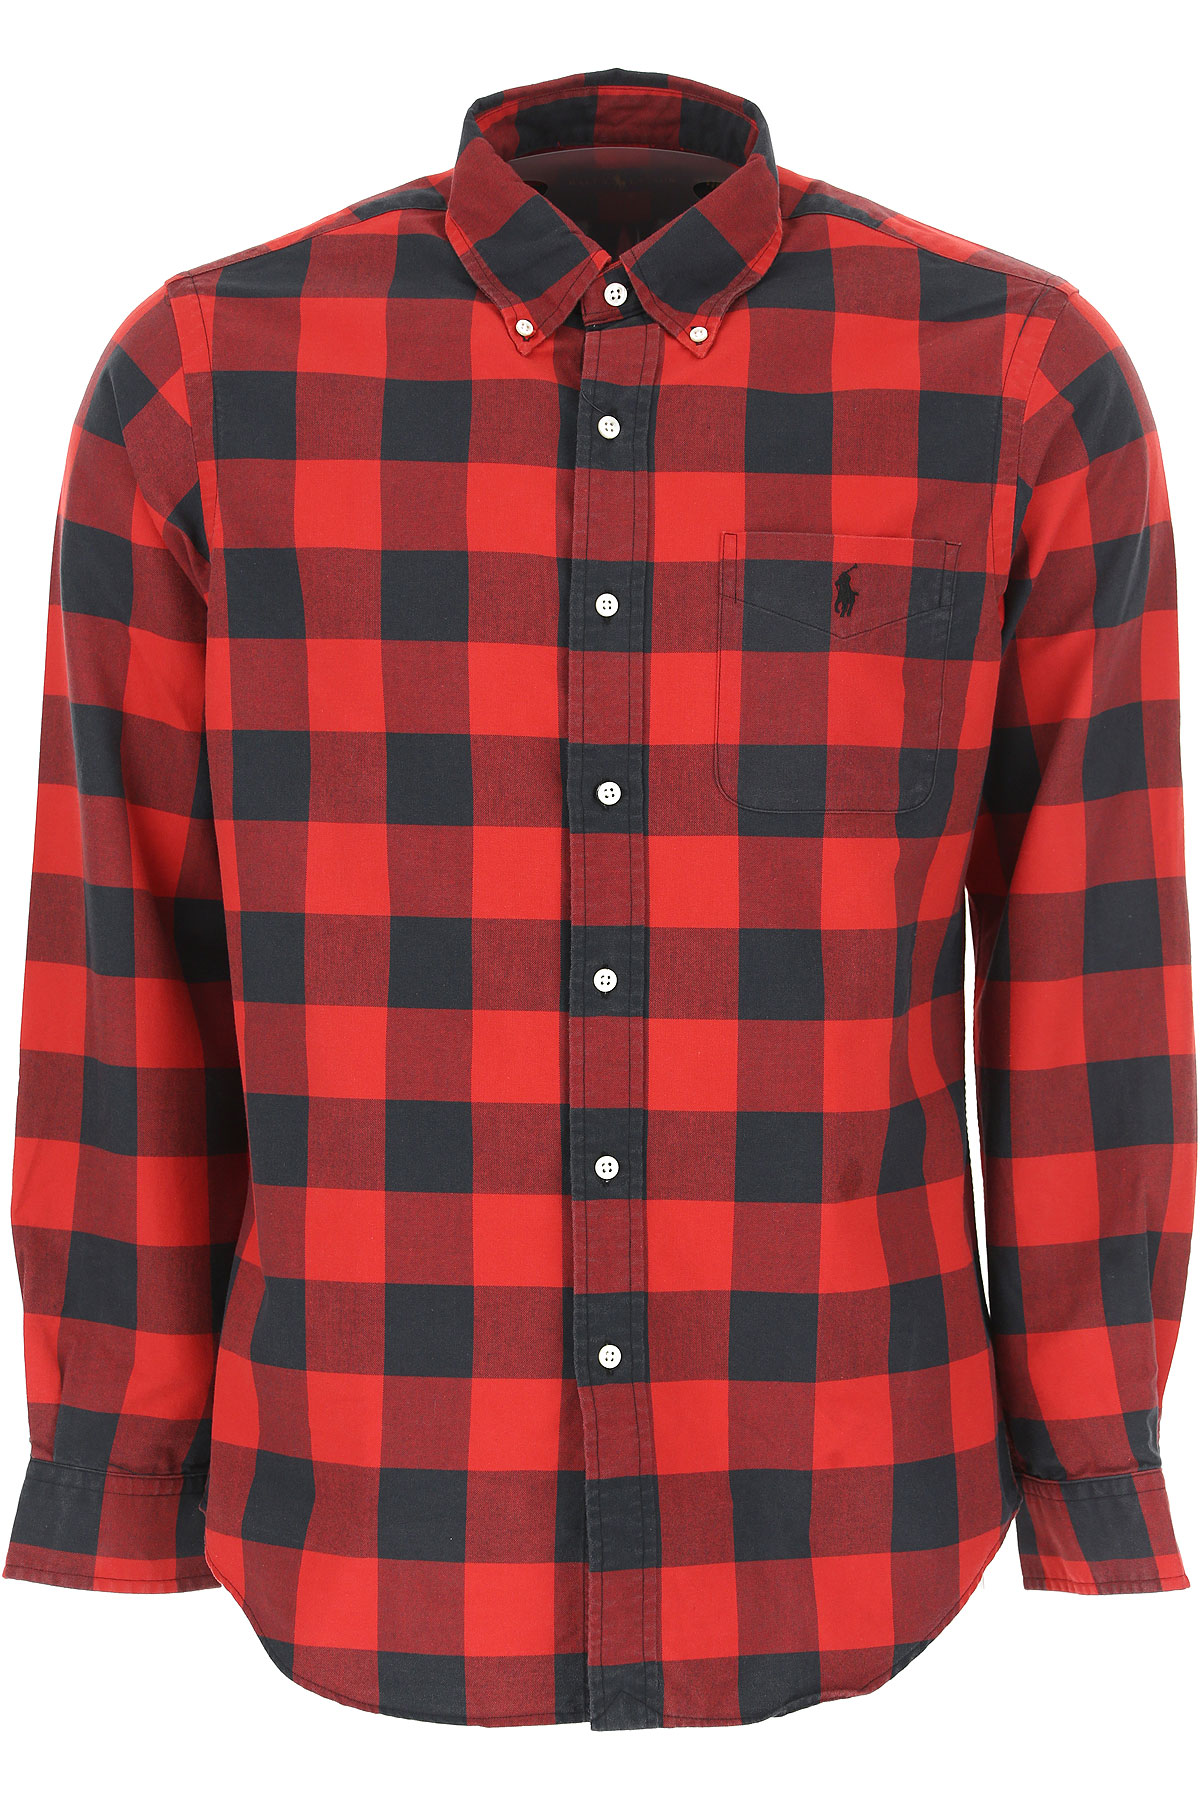 Ralph Lauren Shirt for Men On Sale, Red, Cotton, 2017, M • IT 48 XL • IT 52 USA-464563